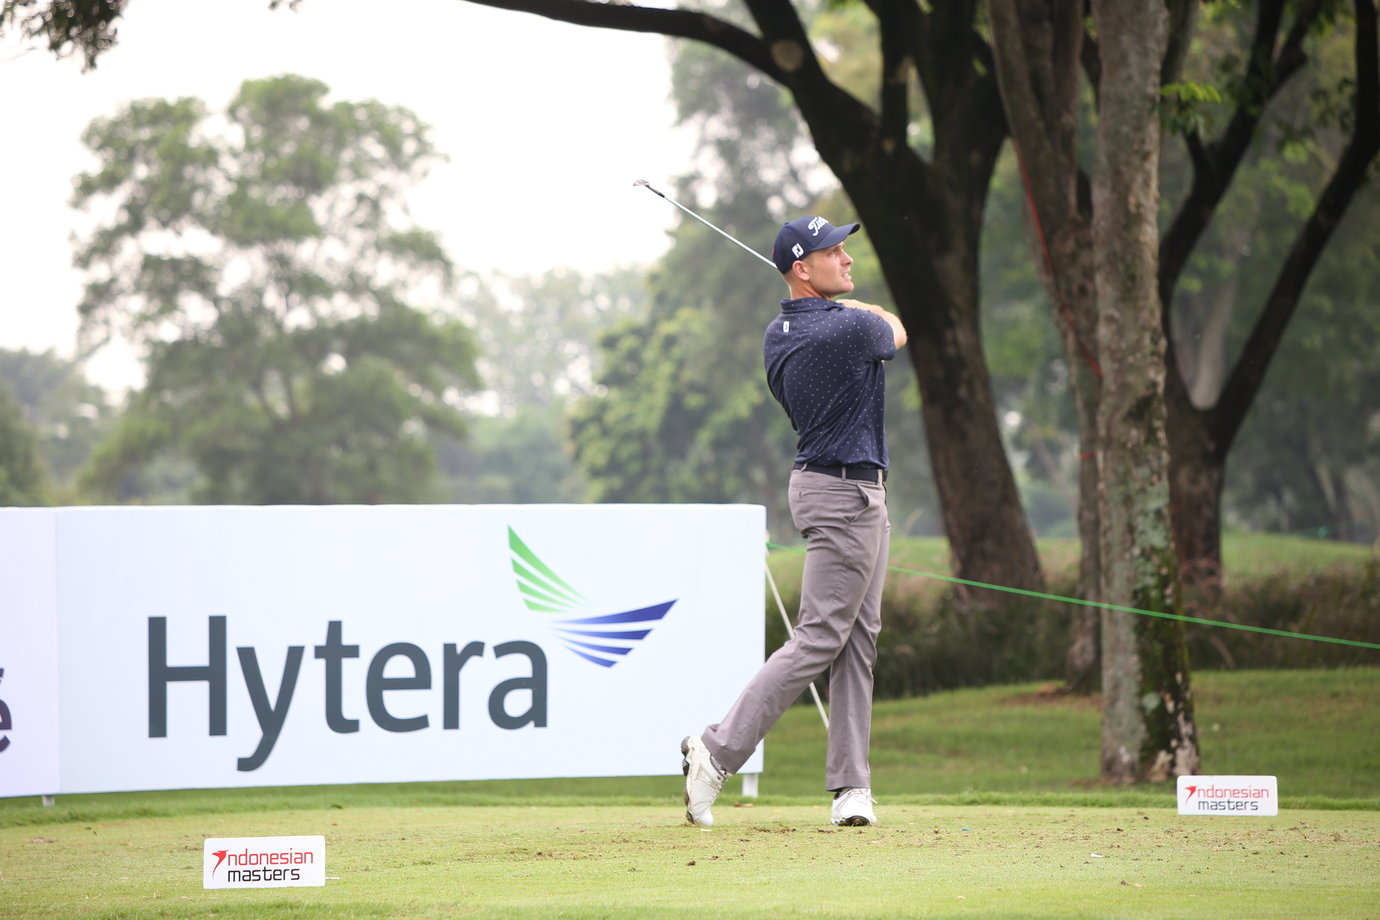 Indonesia Masters 2019 1